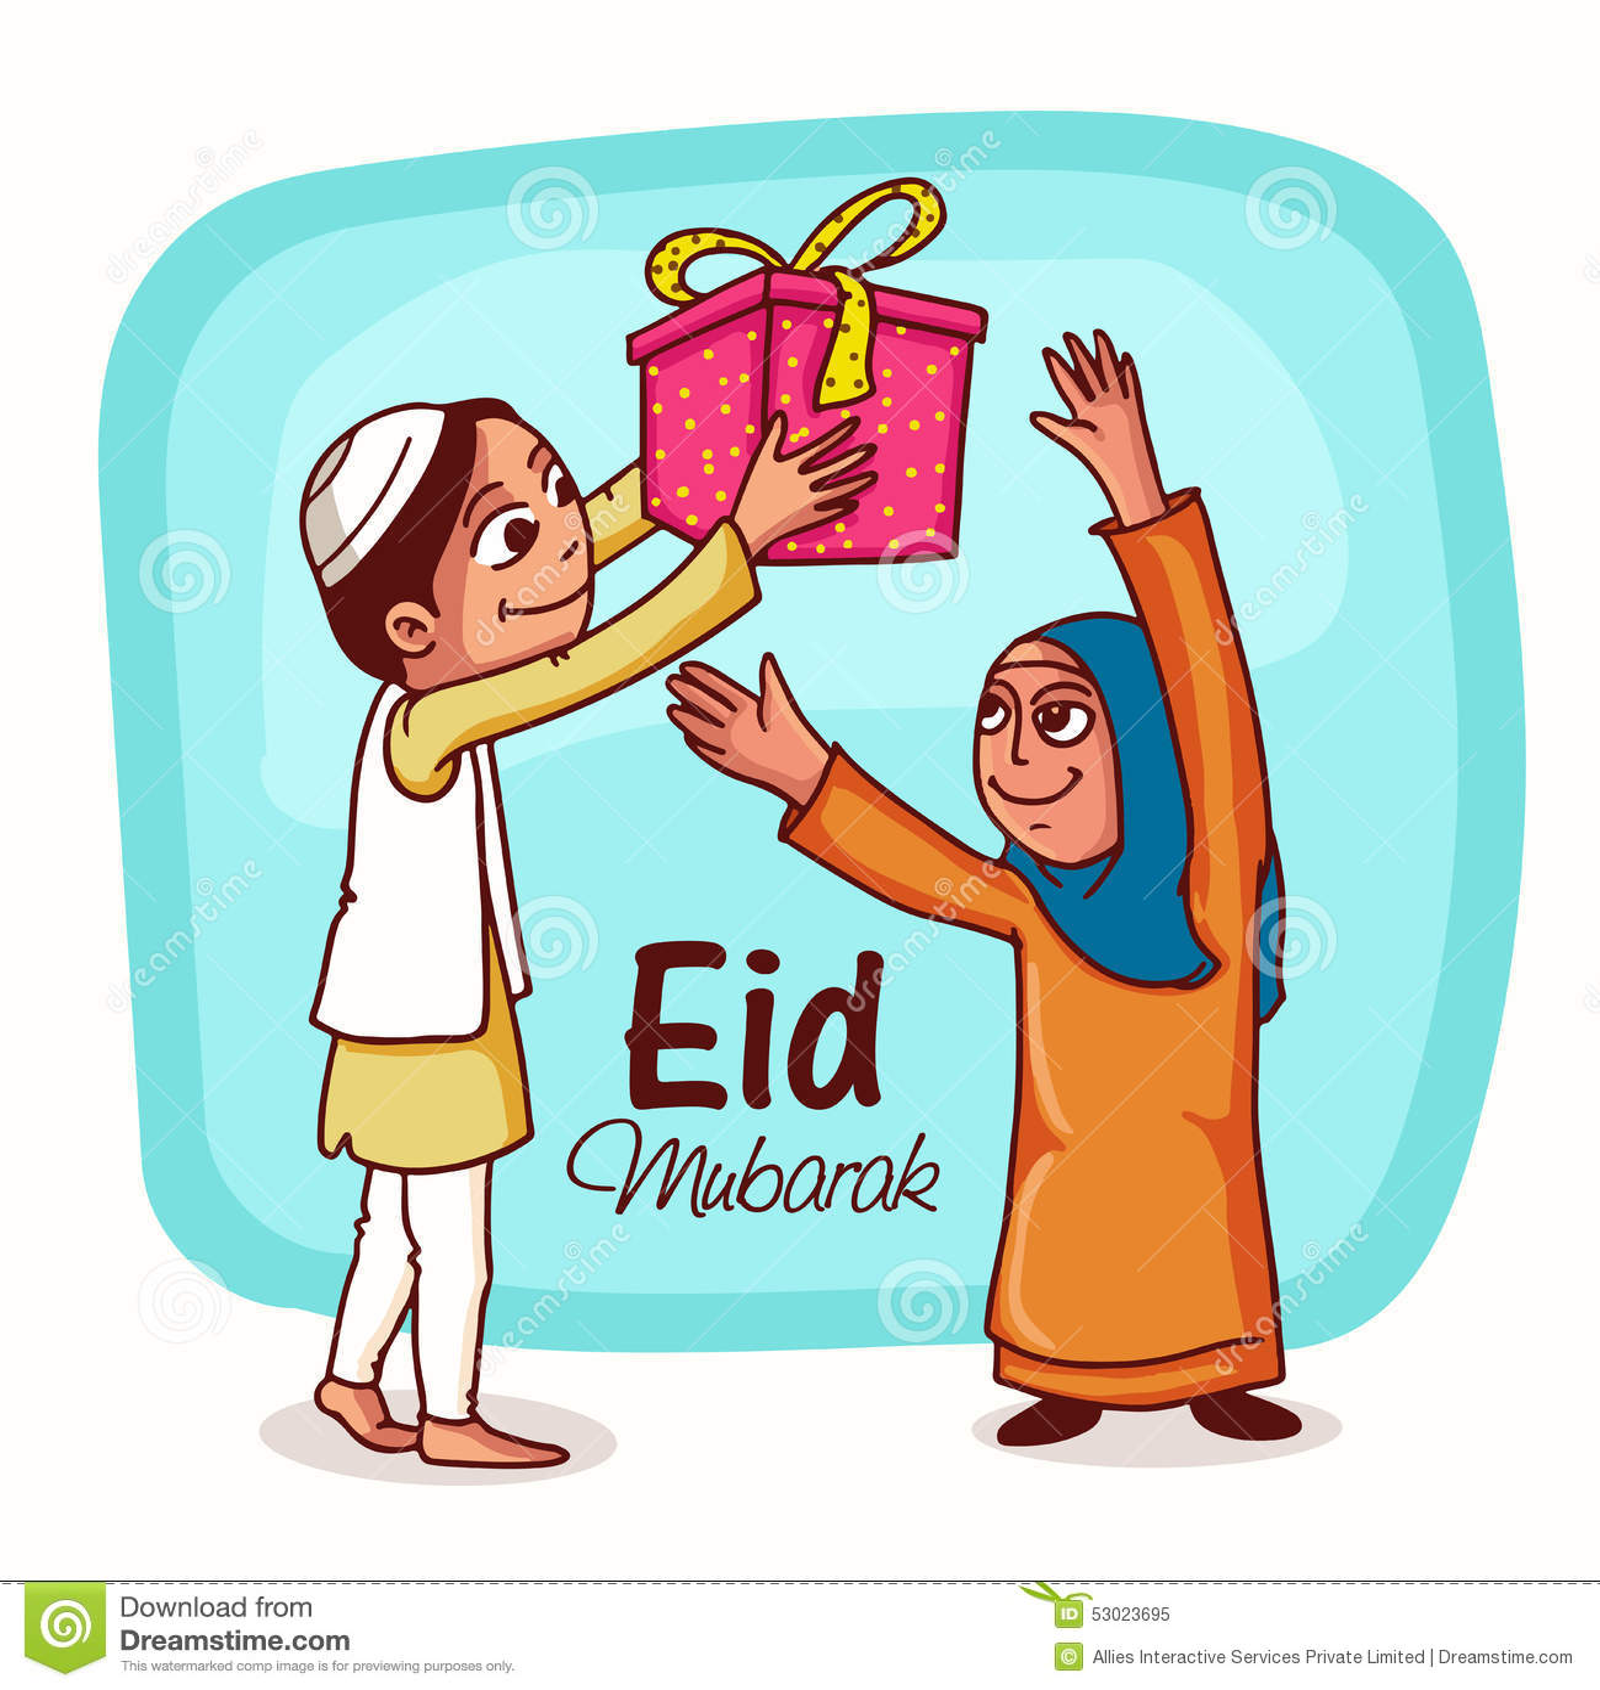 Eid Mubarak Celebration With Happy Islamic People. Stock ...